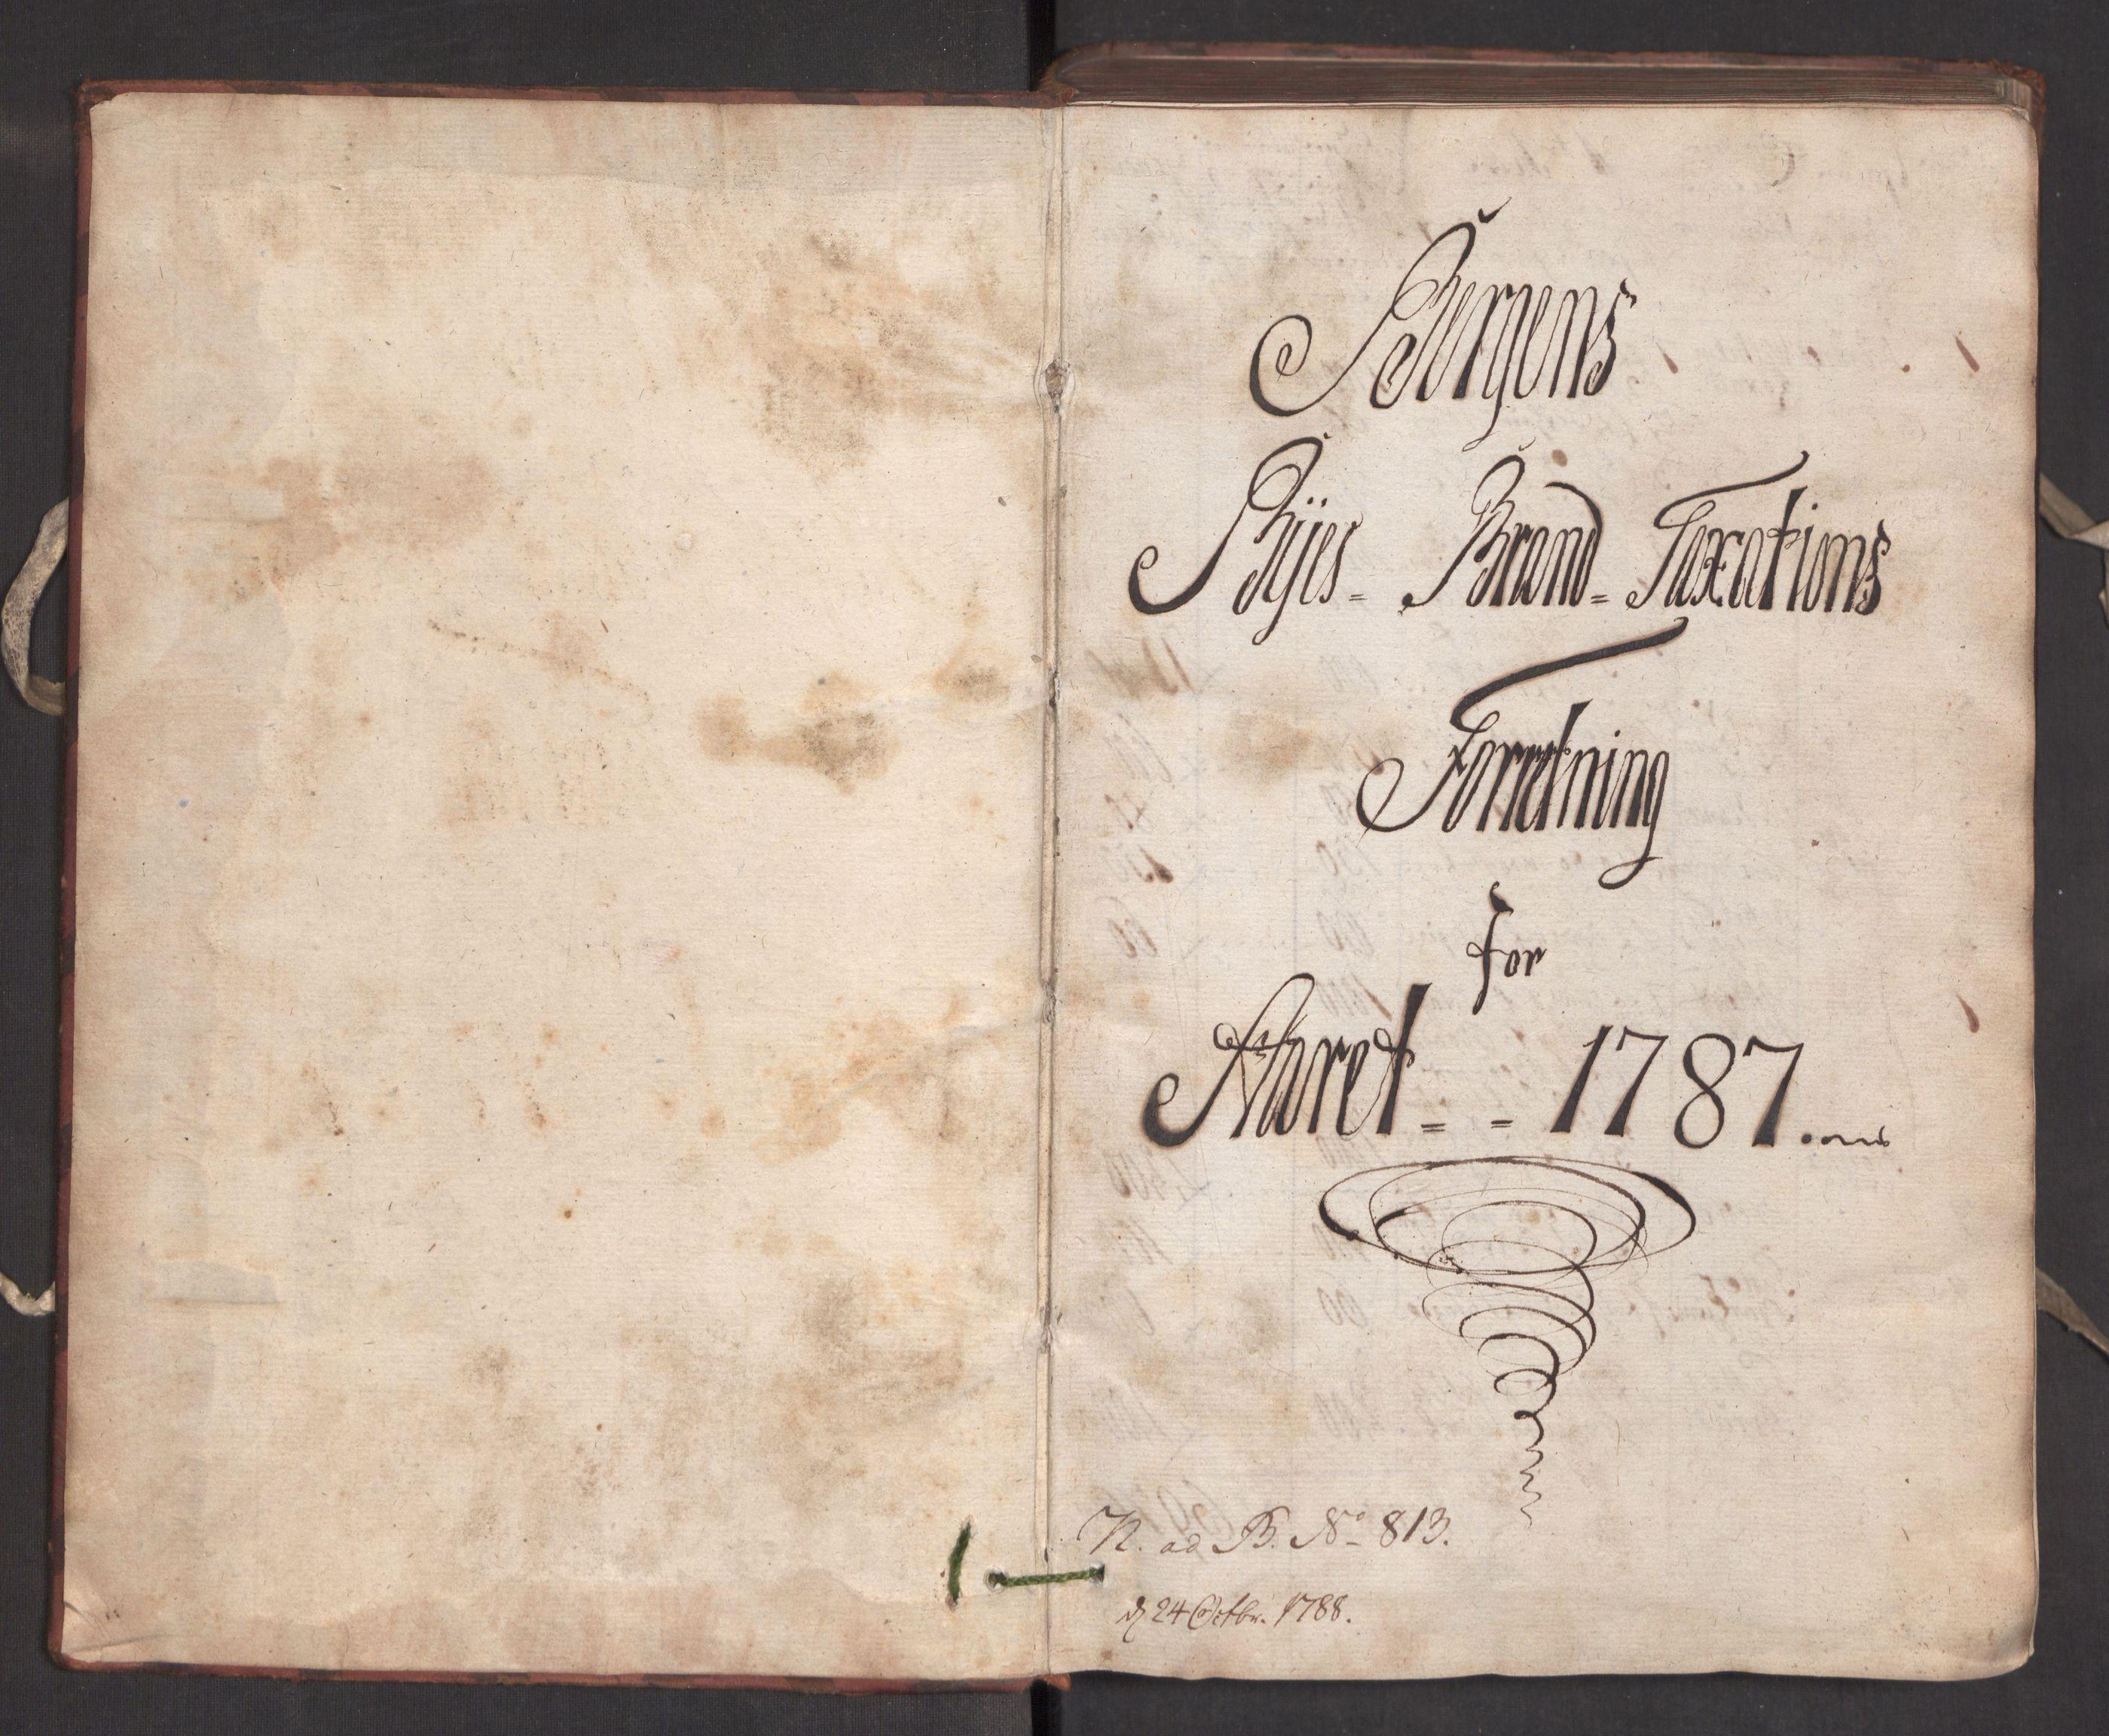 RA, Kommersekollegiet, Brannforsikringskontoret 1767-1814, F/Fa/L0005: Bergen, 1787